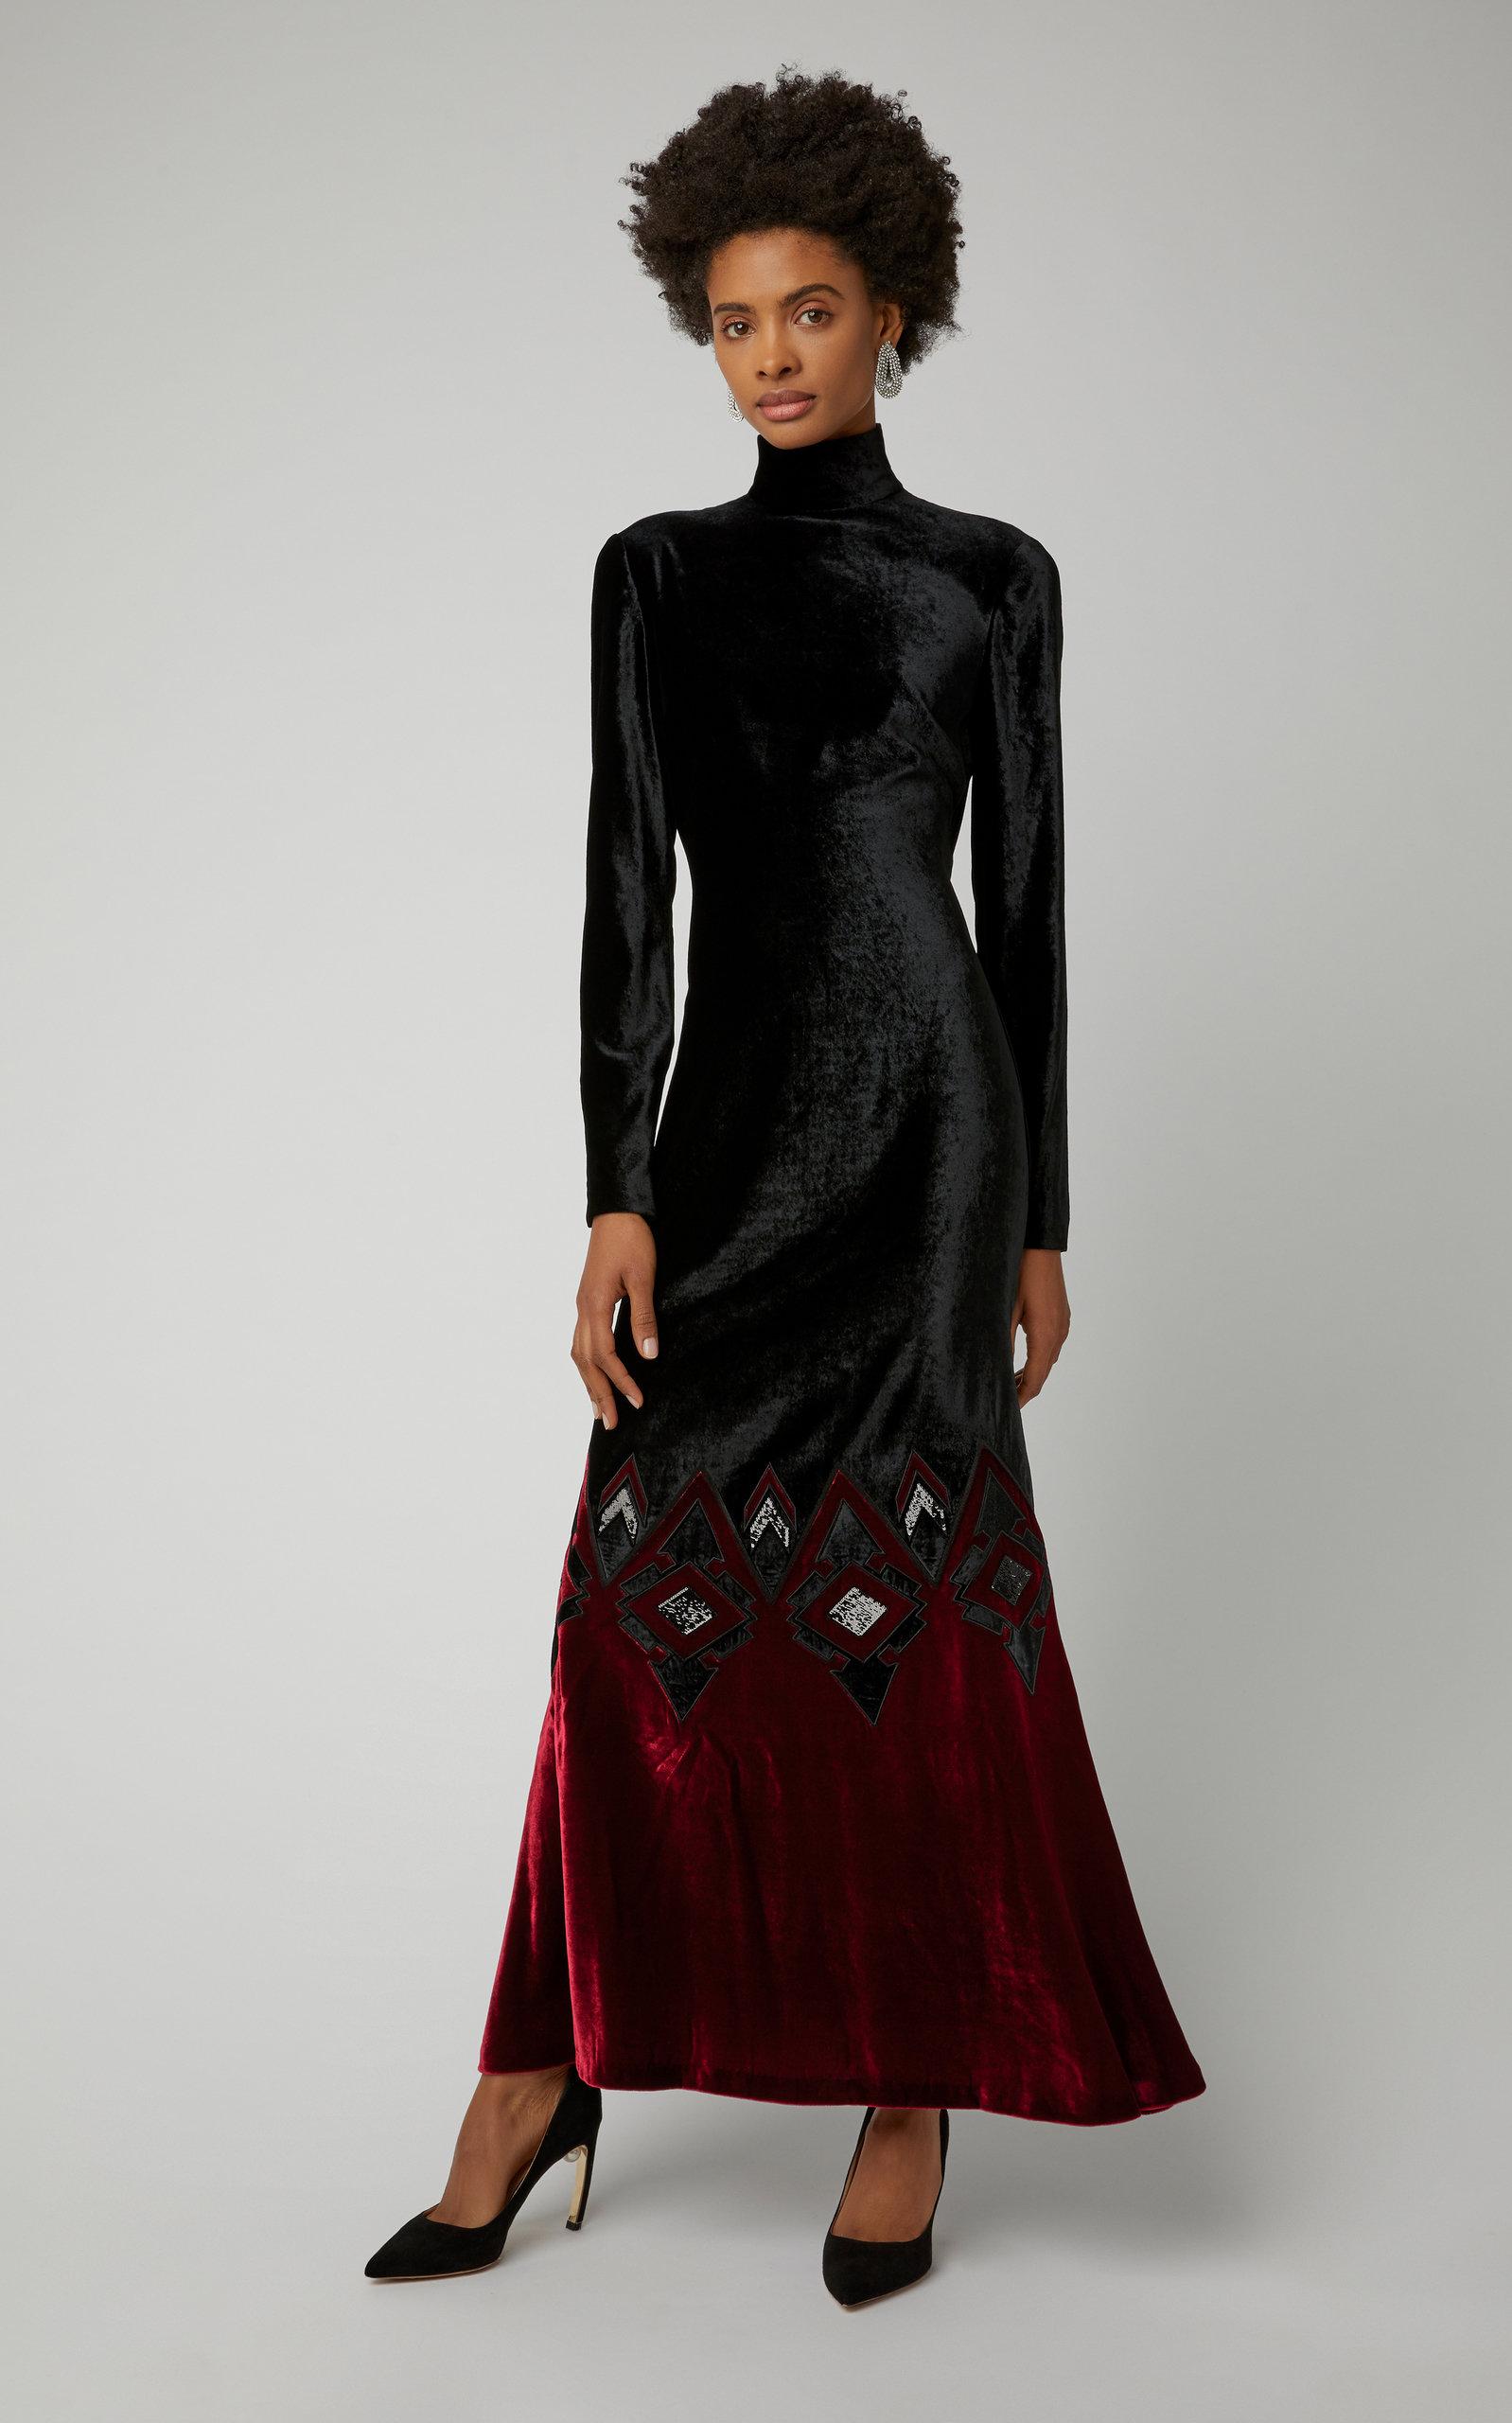 Reiley Long Sleeve Ombre Velvet Evening Dress By Ralph Moda Operandi